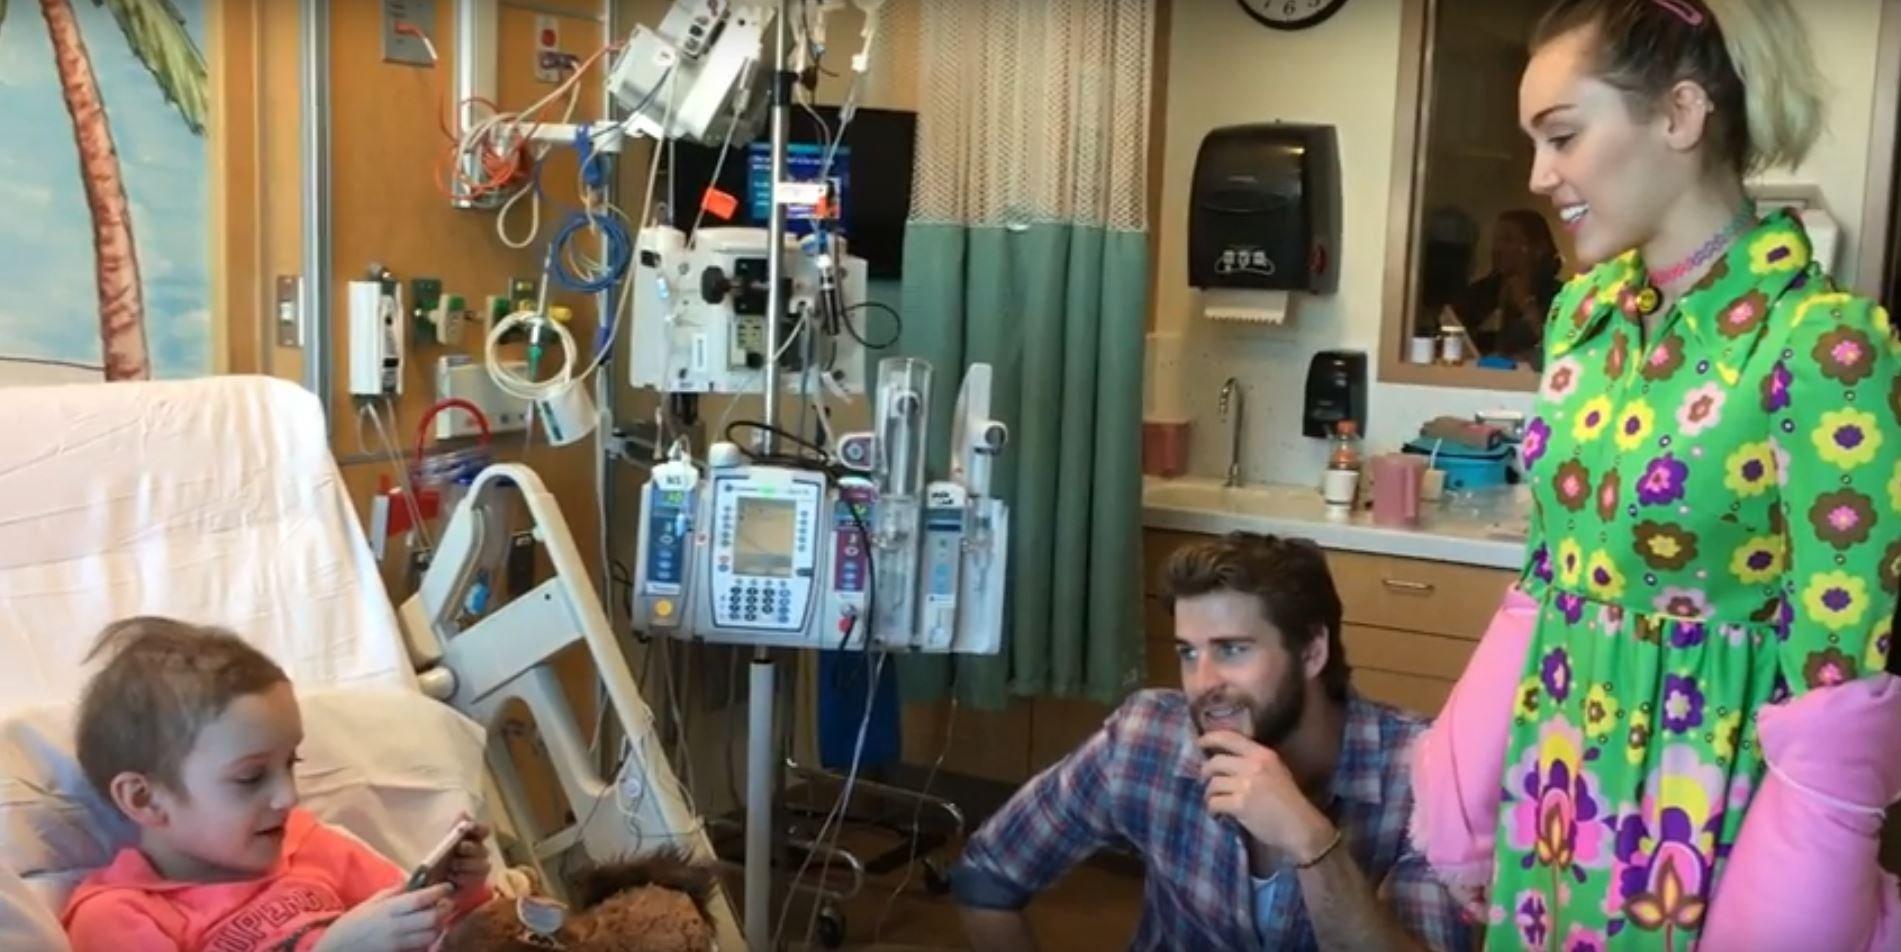 Miley Cyrus, Liam Hemsworth visit patients at Rady Children's Hospital